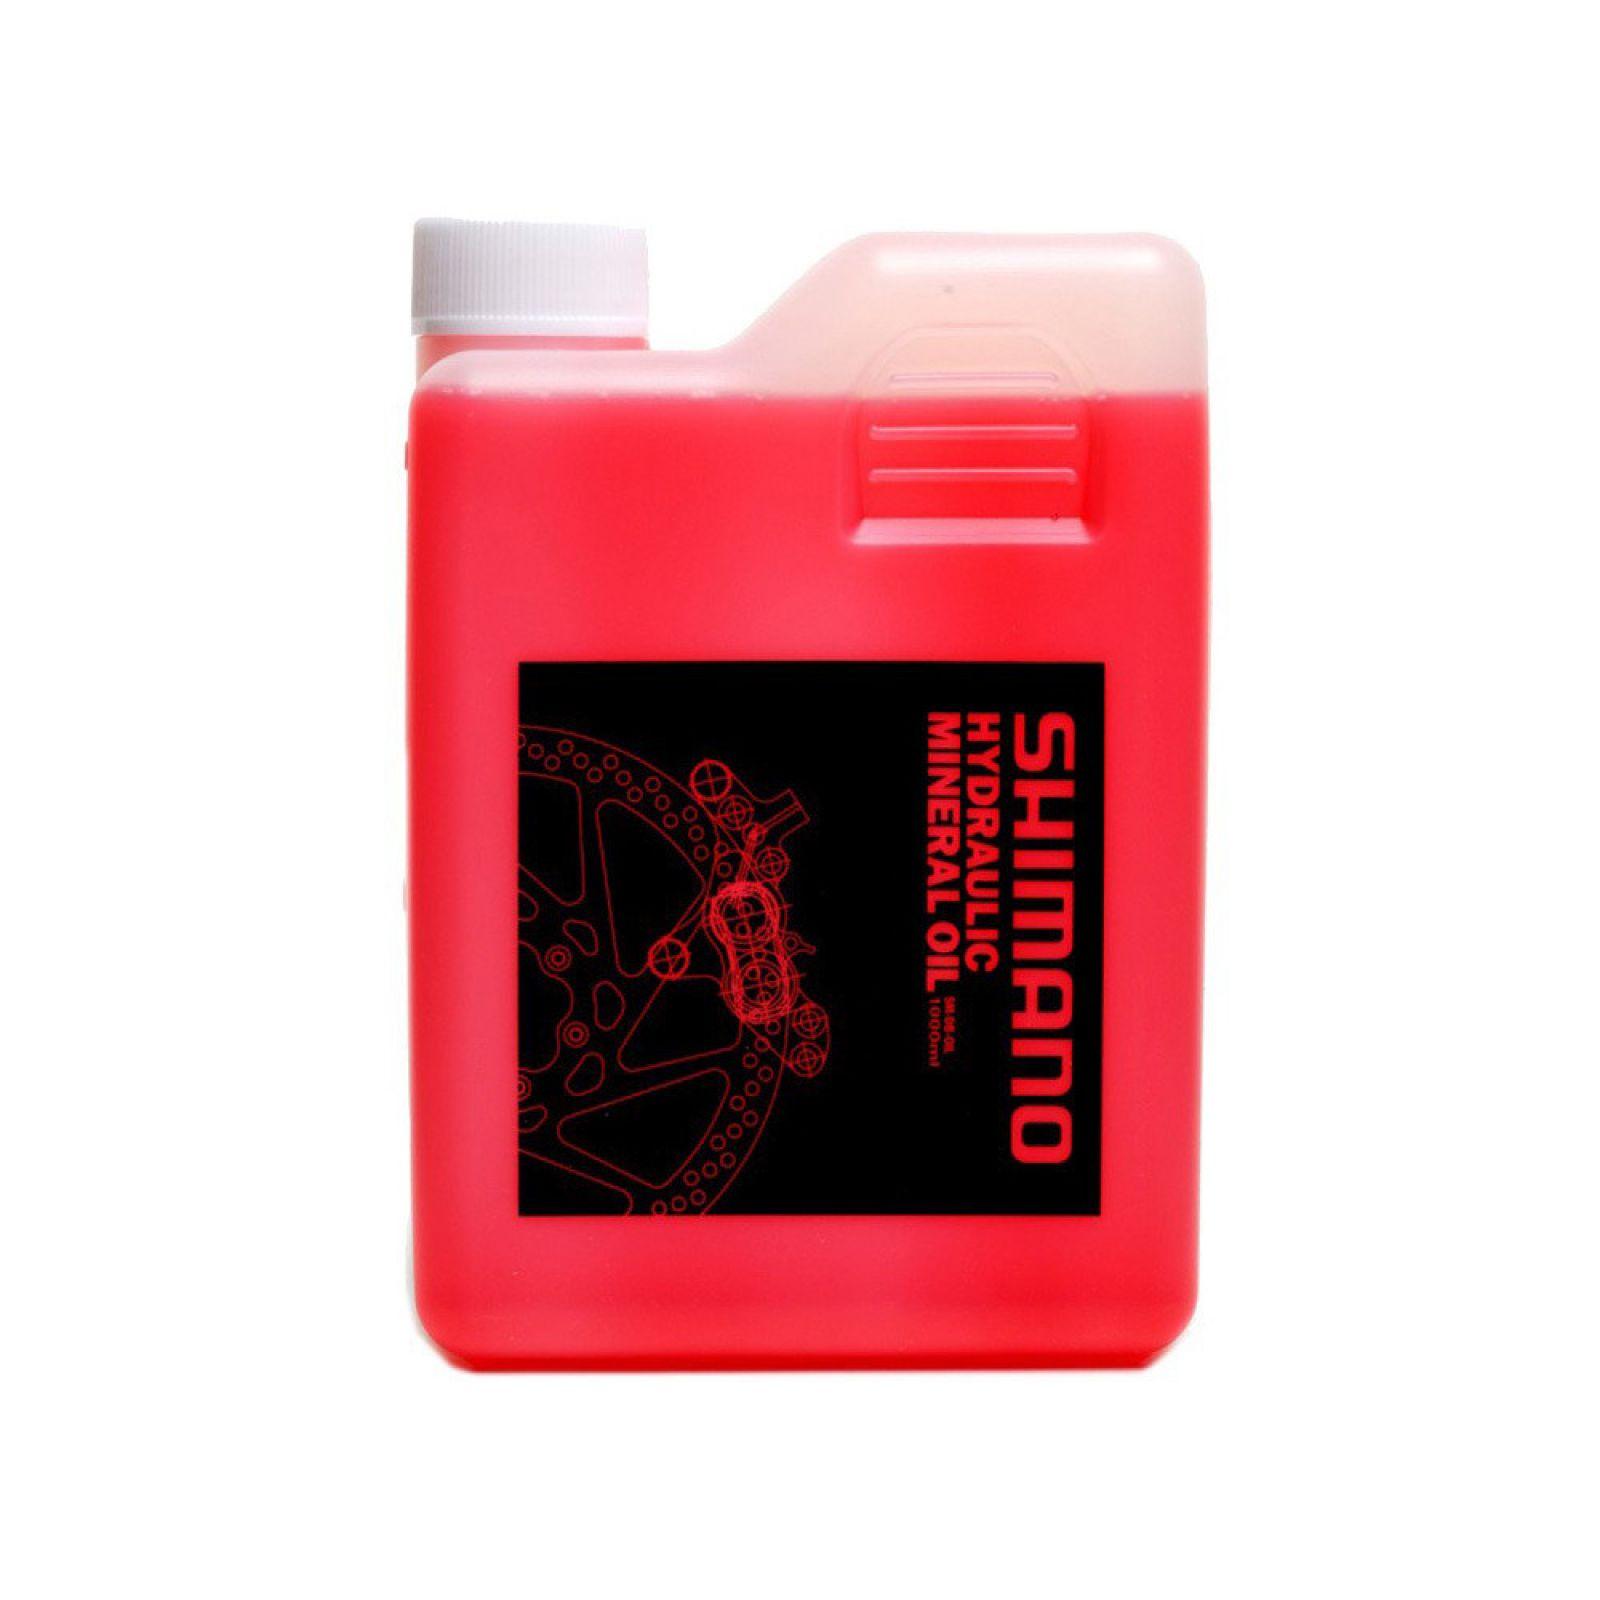 Shimano oil для тормозов